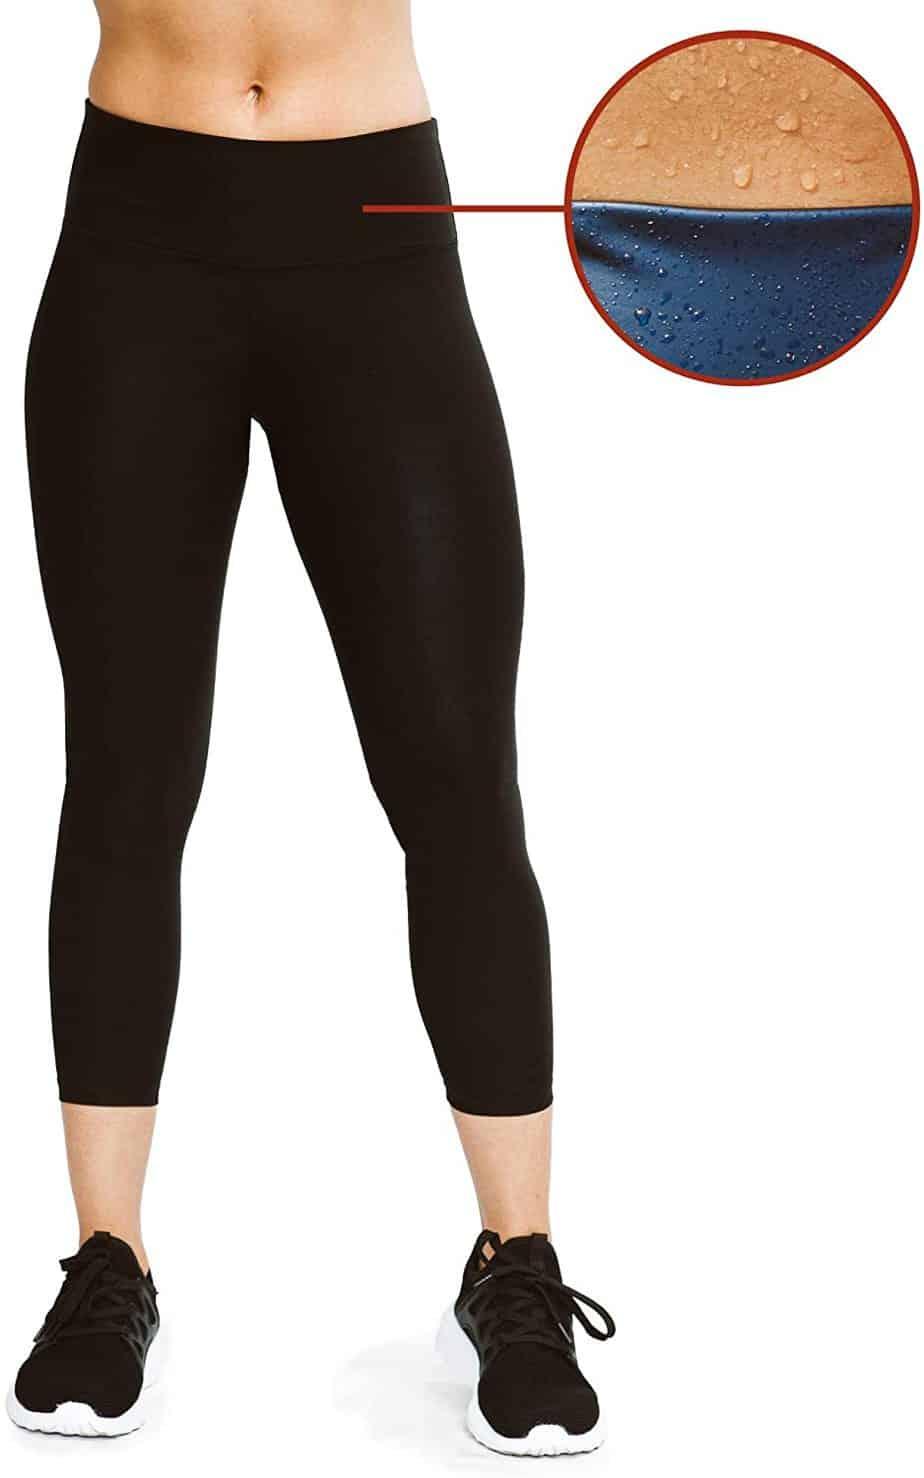 Sweat Shaper Women's Slimming Leggings